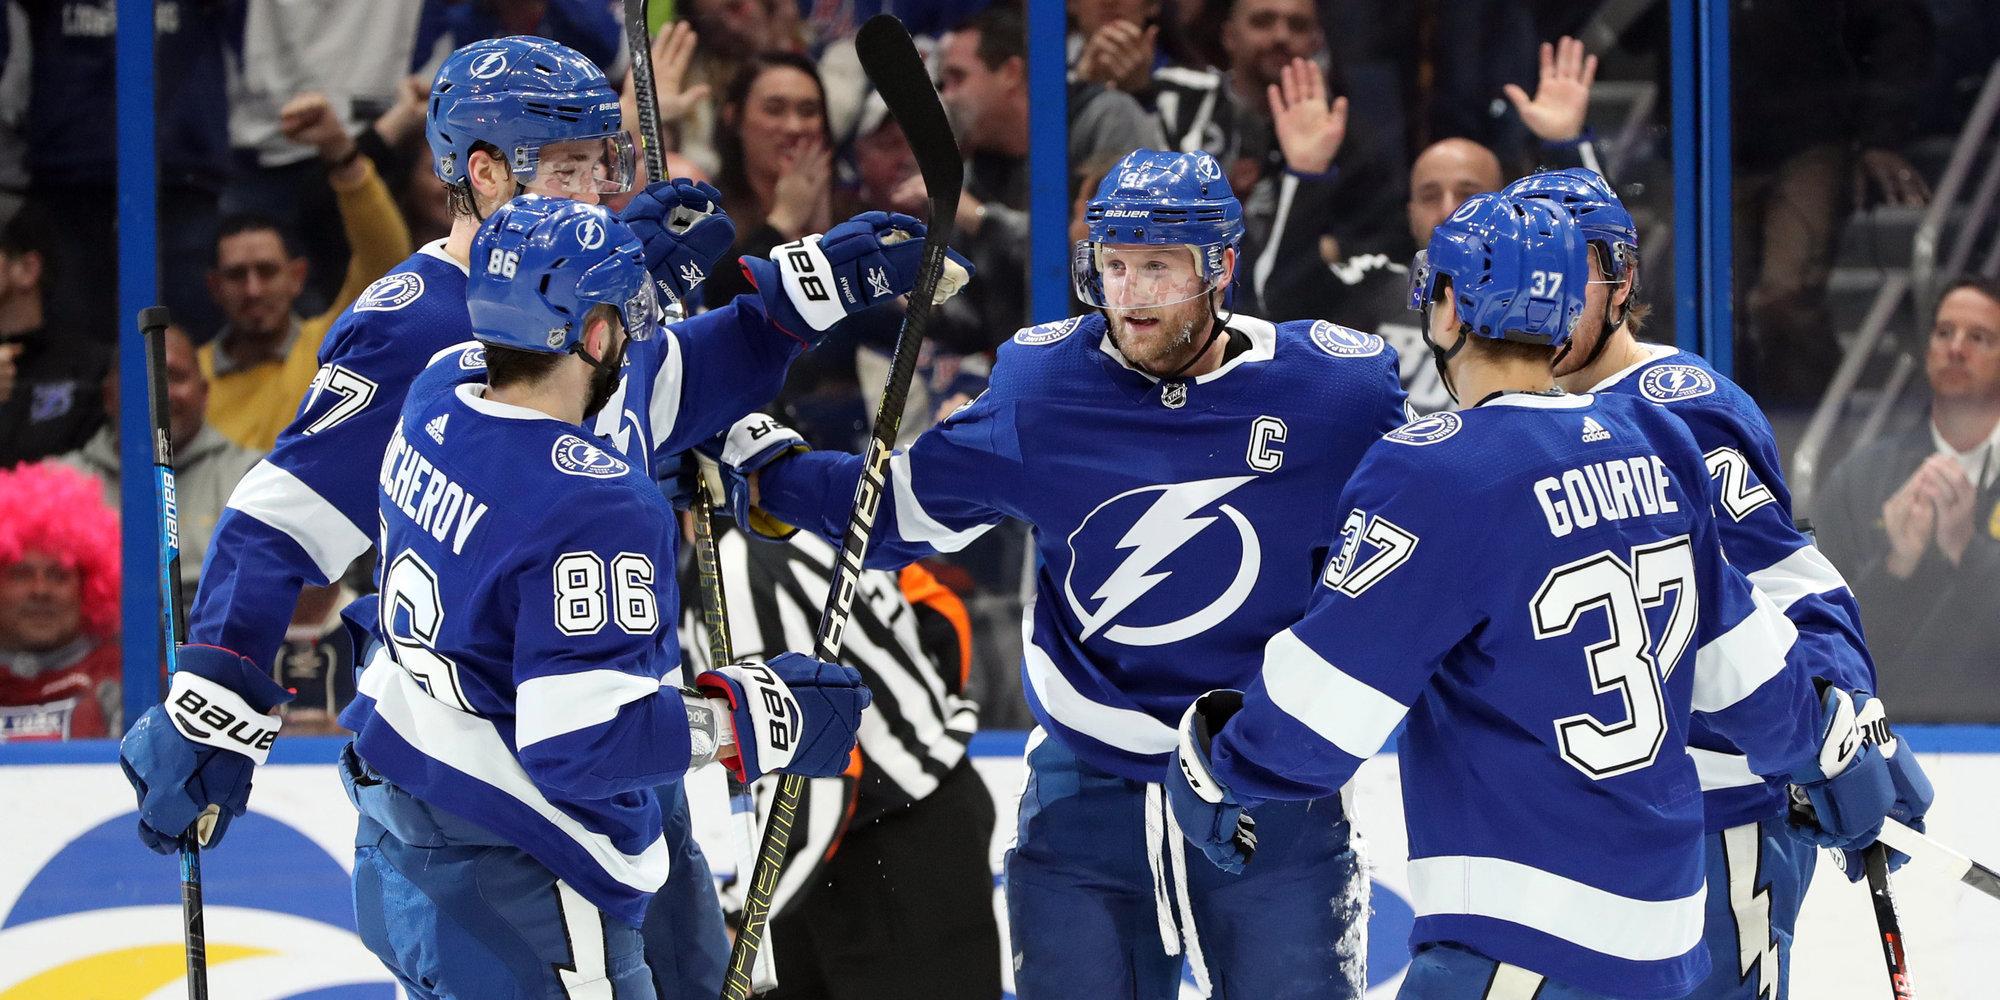 Что приготовил нам новый сезон НХЛ?